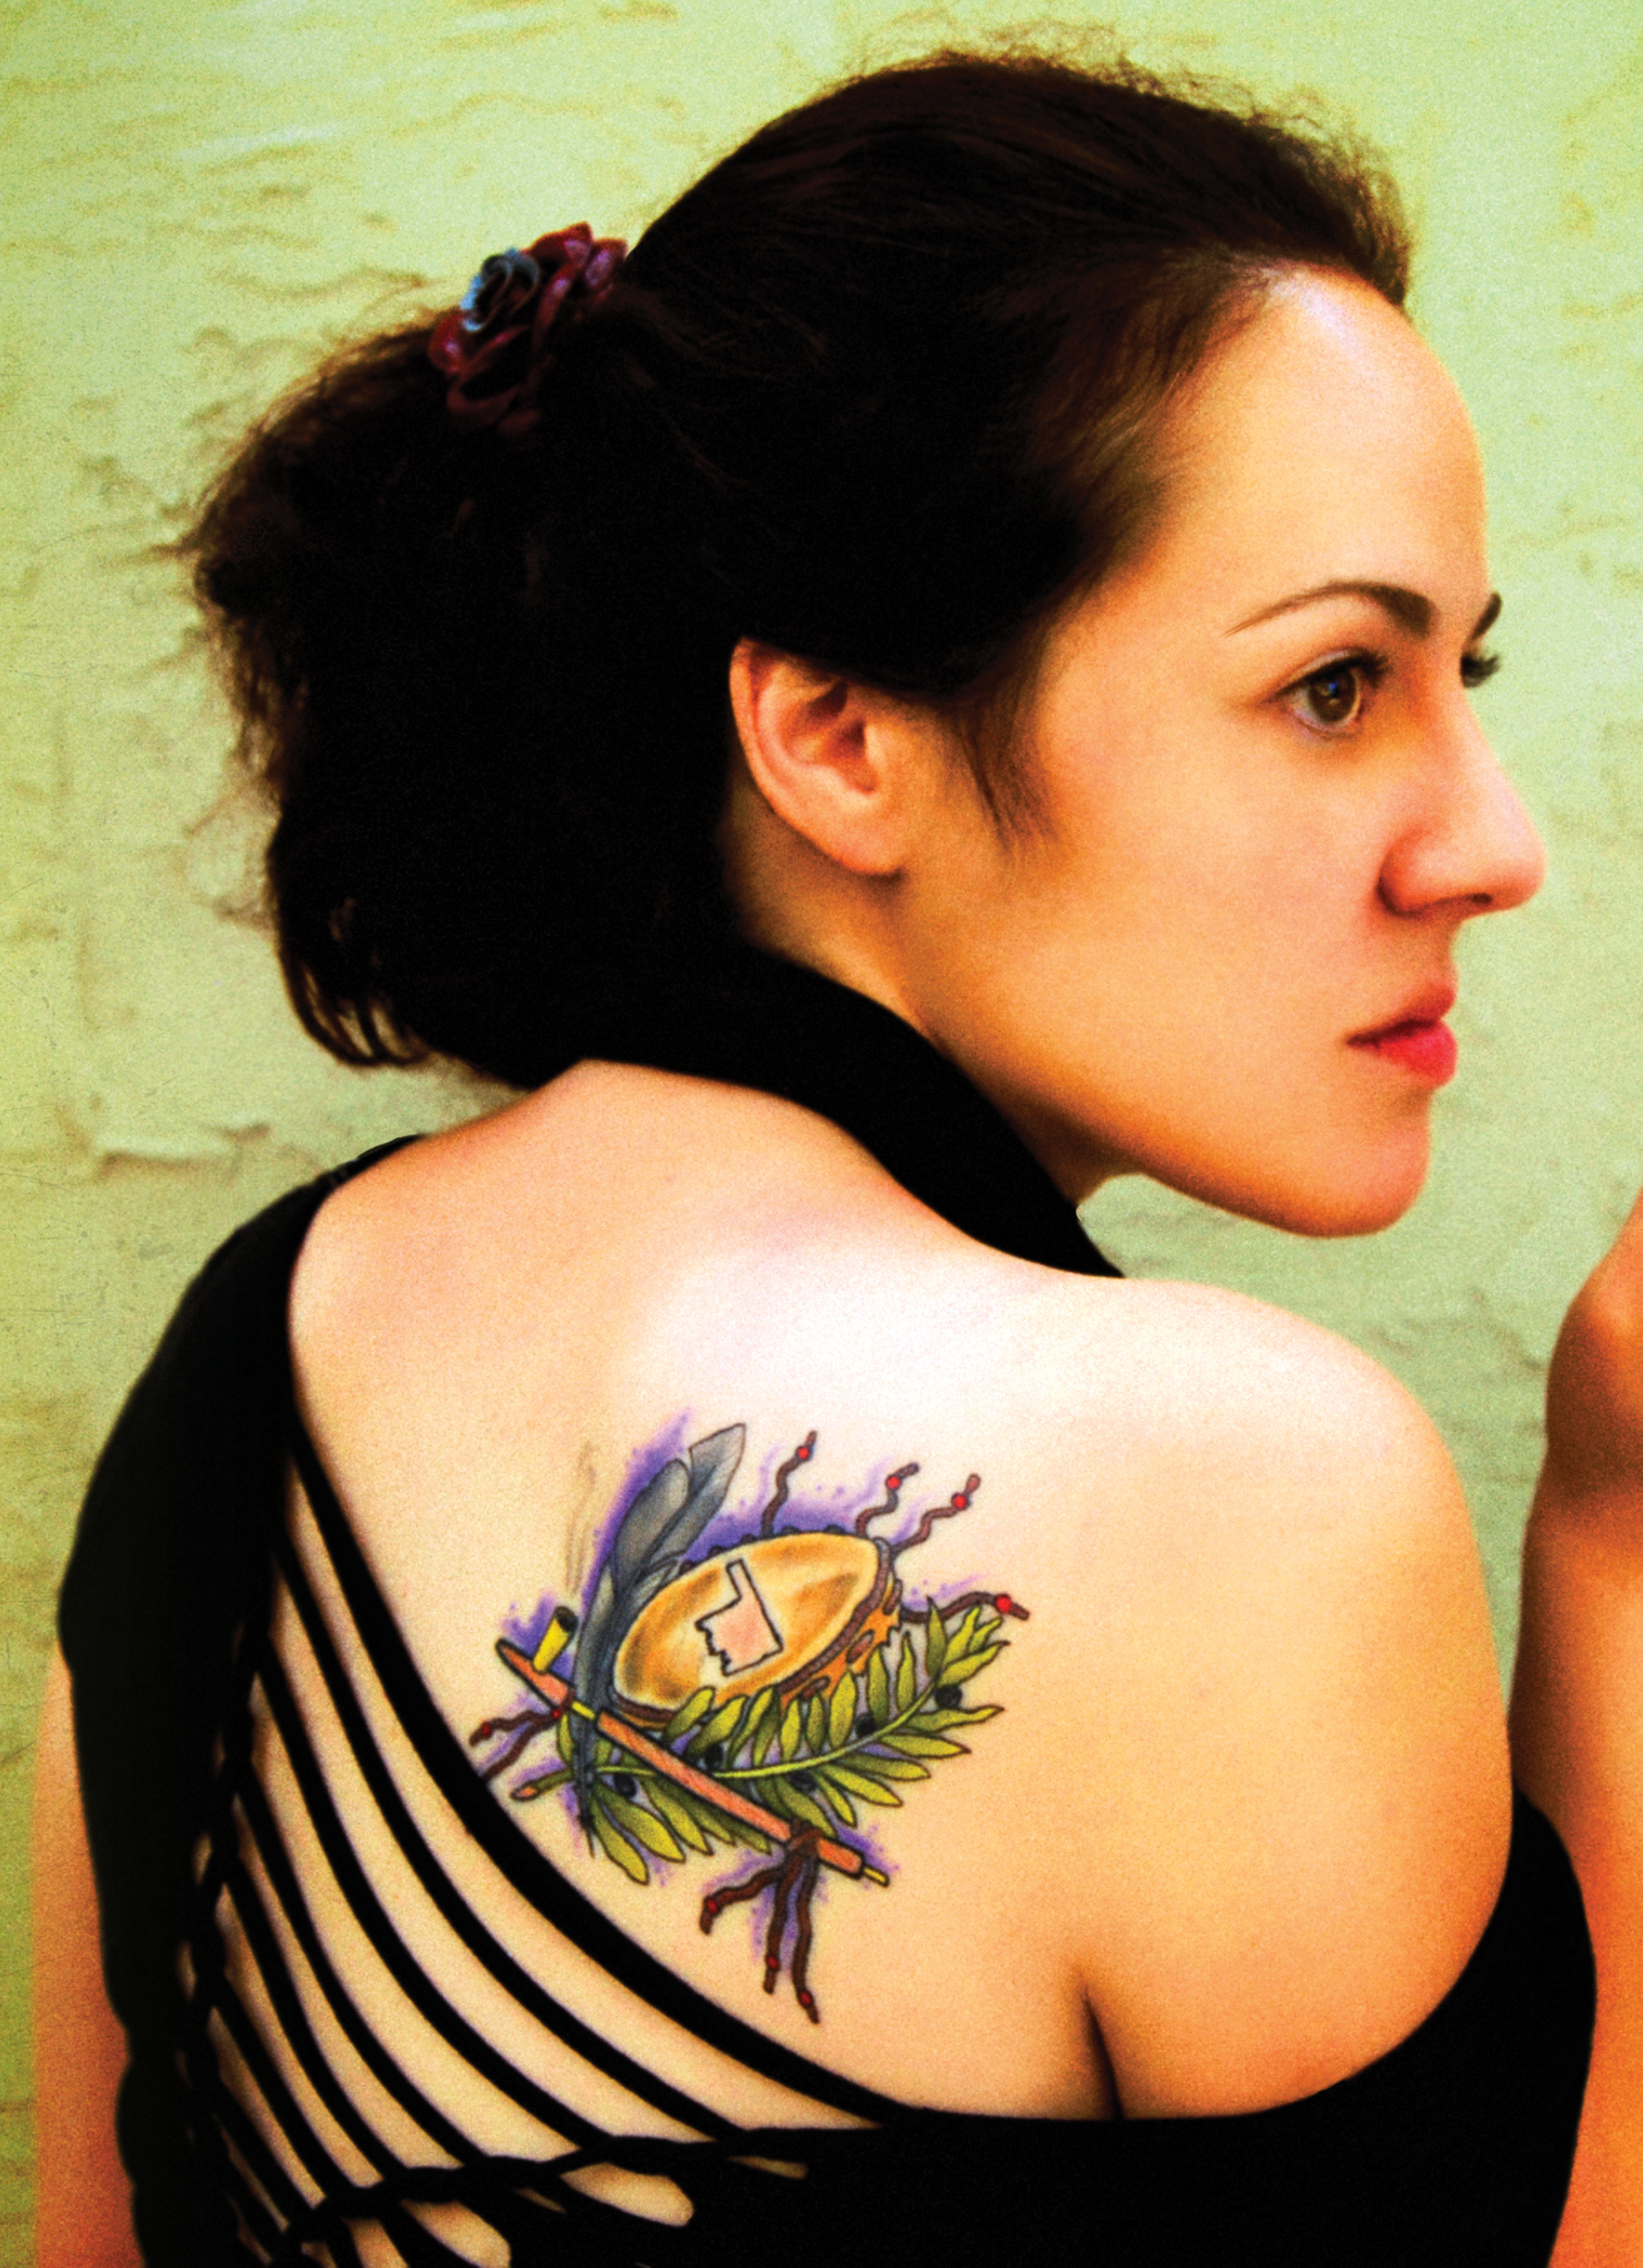 Author Photo (jpg): Maya Sloan